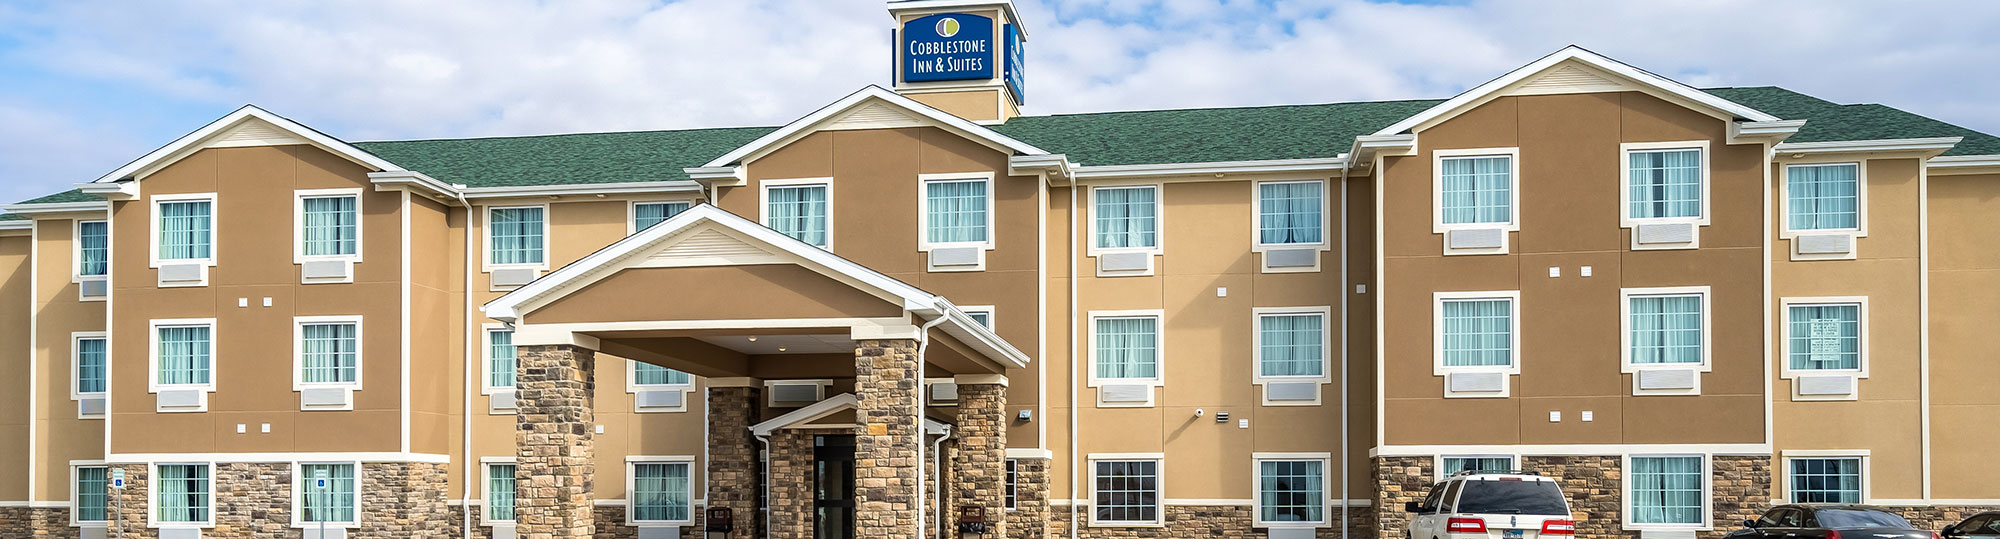 Cobblestone Inn & Suites Kermit